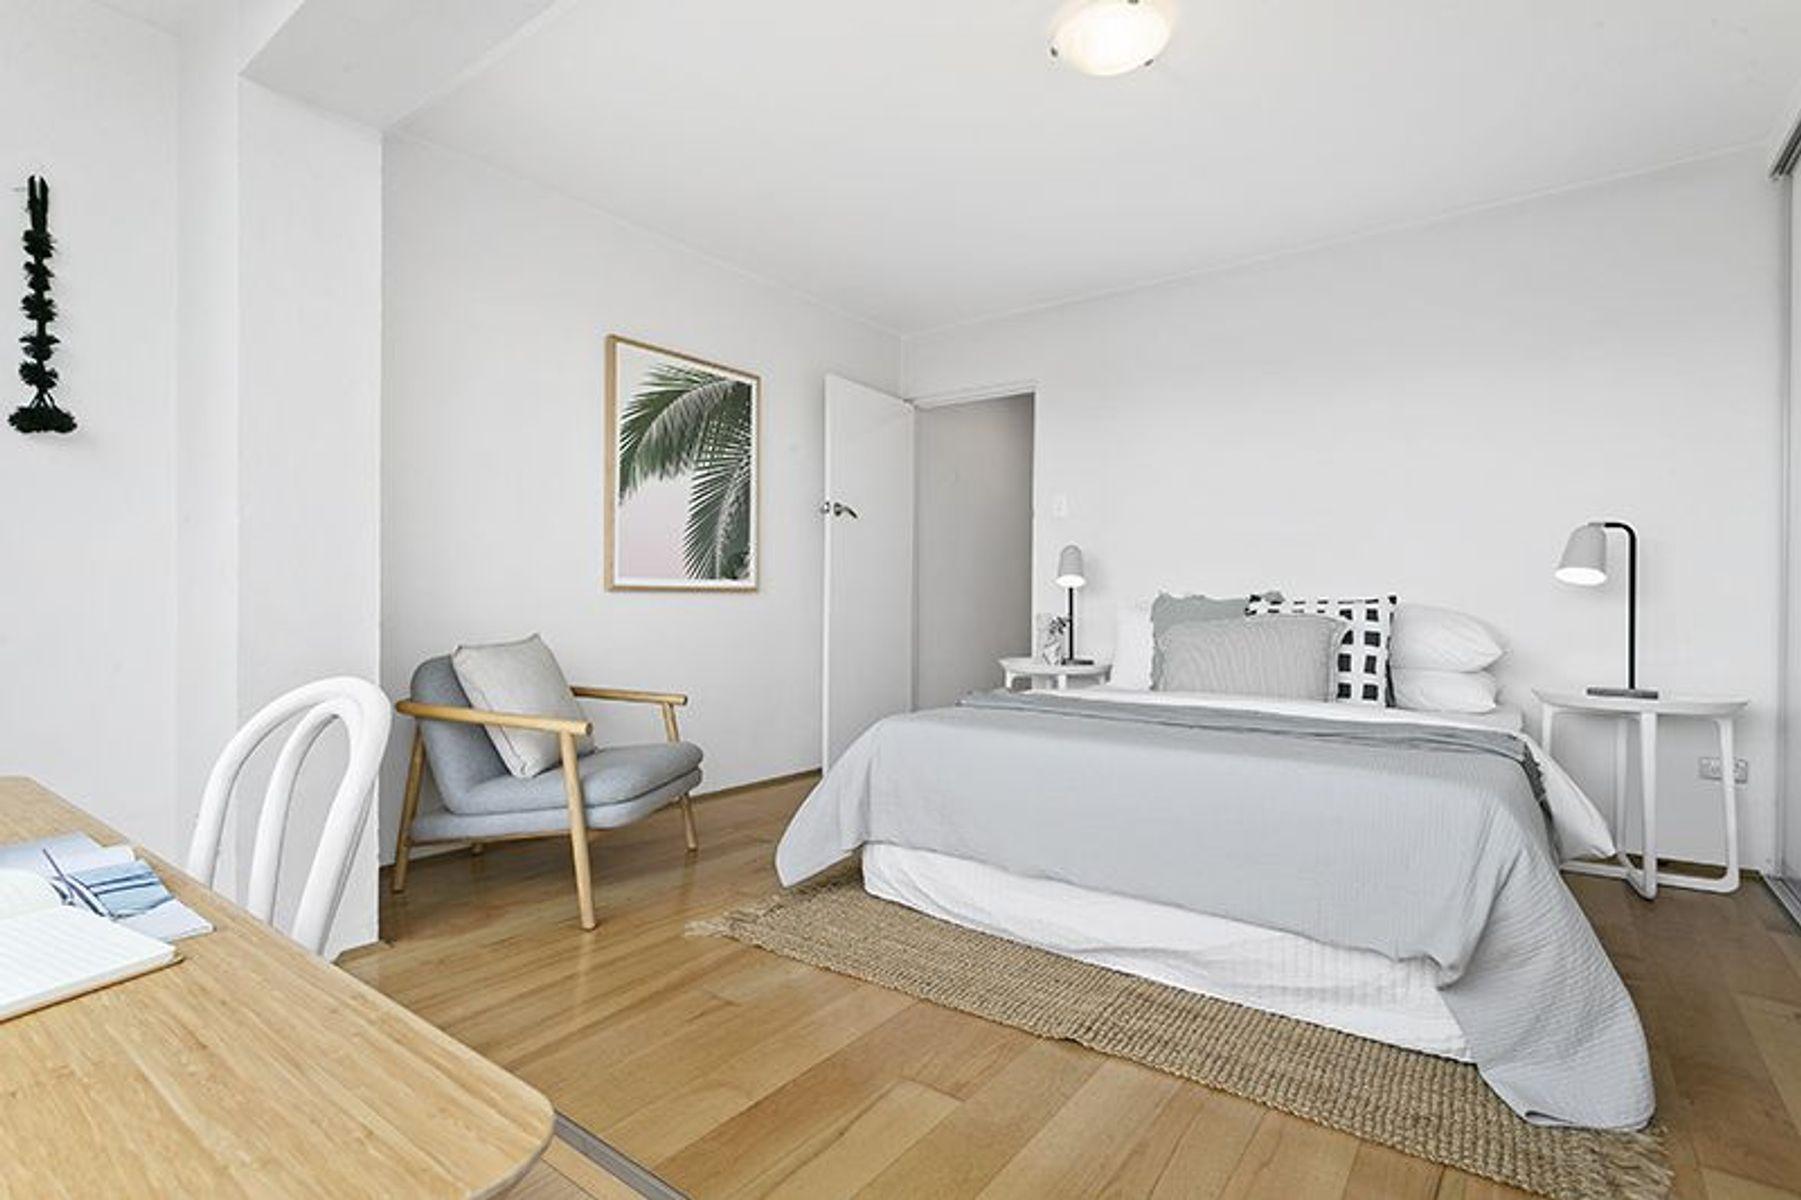 6/43 Bond Street, Maroubra, NSW 2035